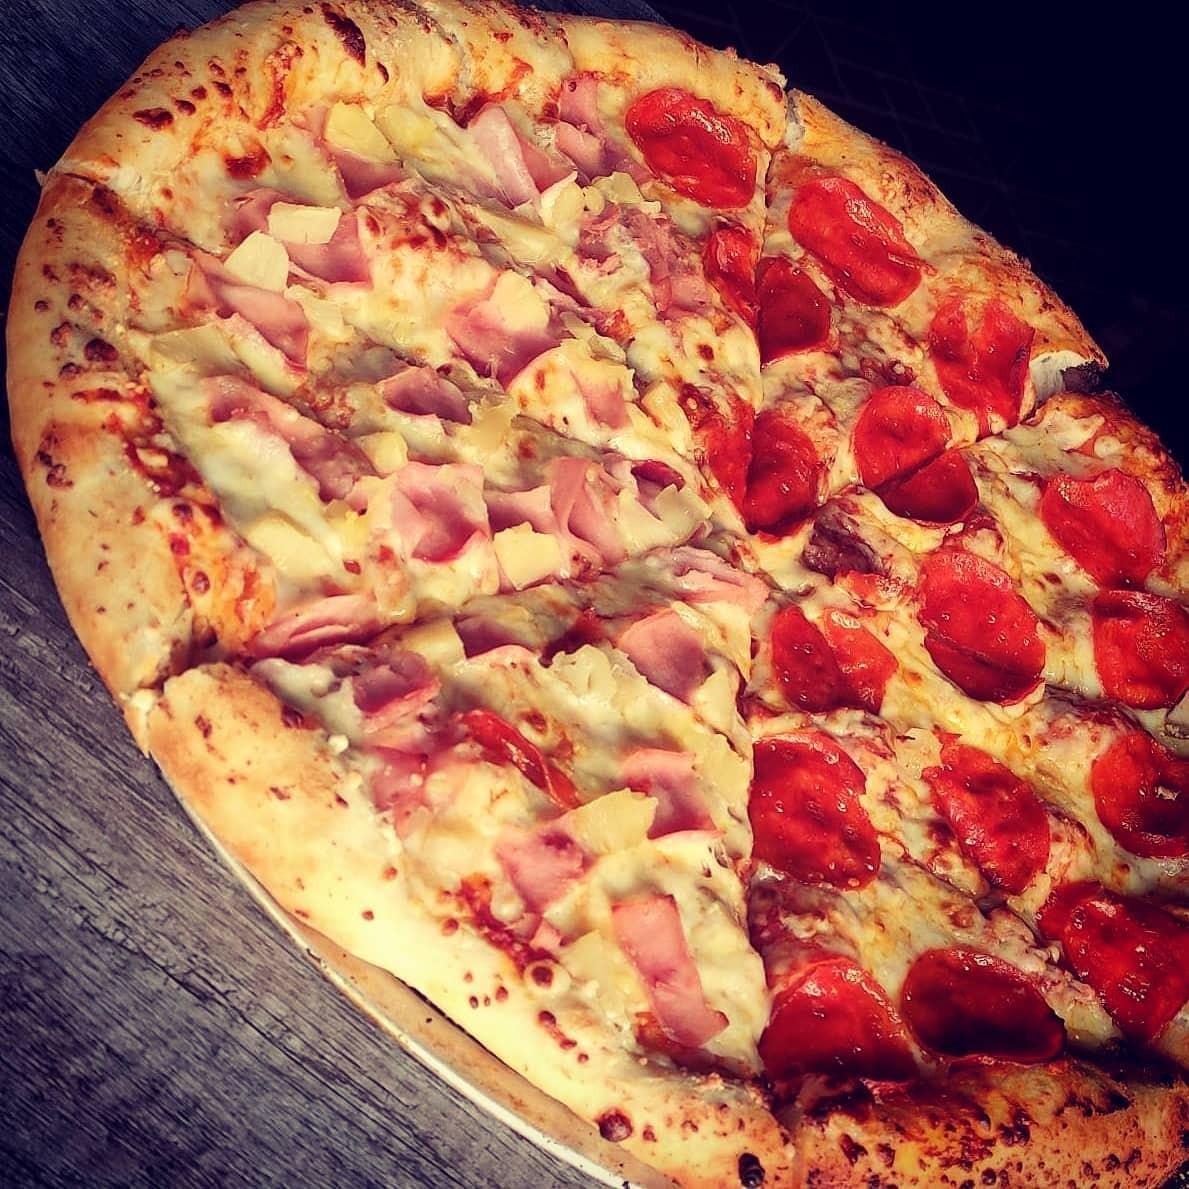 Paquete 1 Pizza Familiar y 1 Refresco